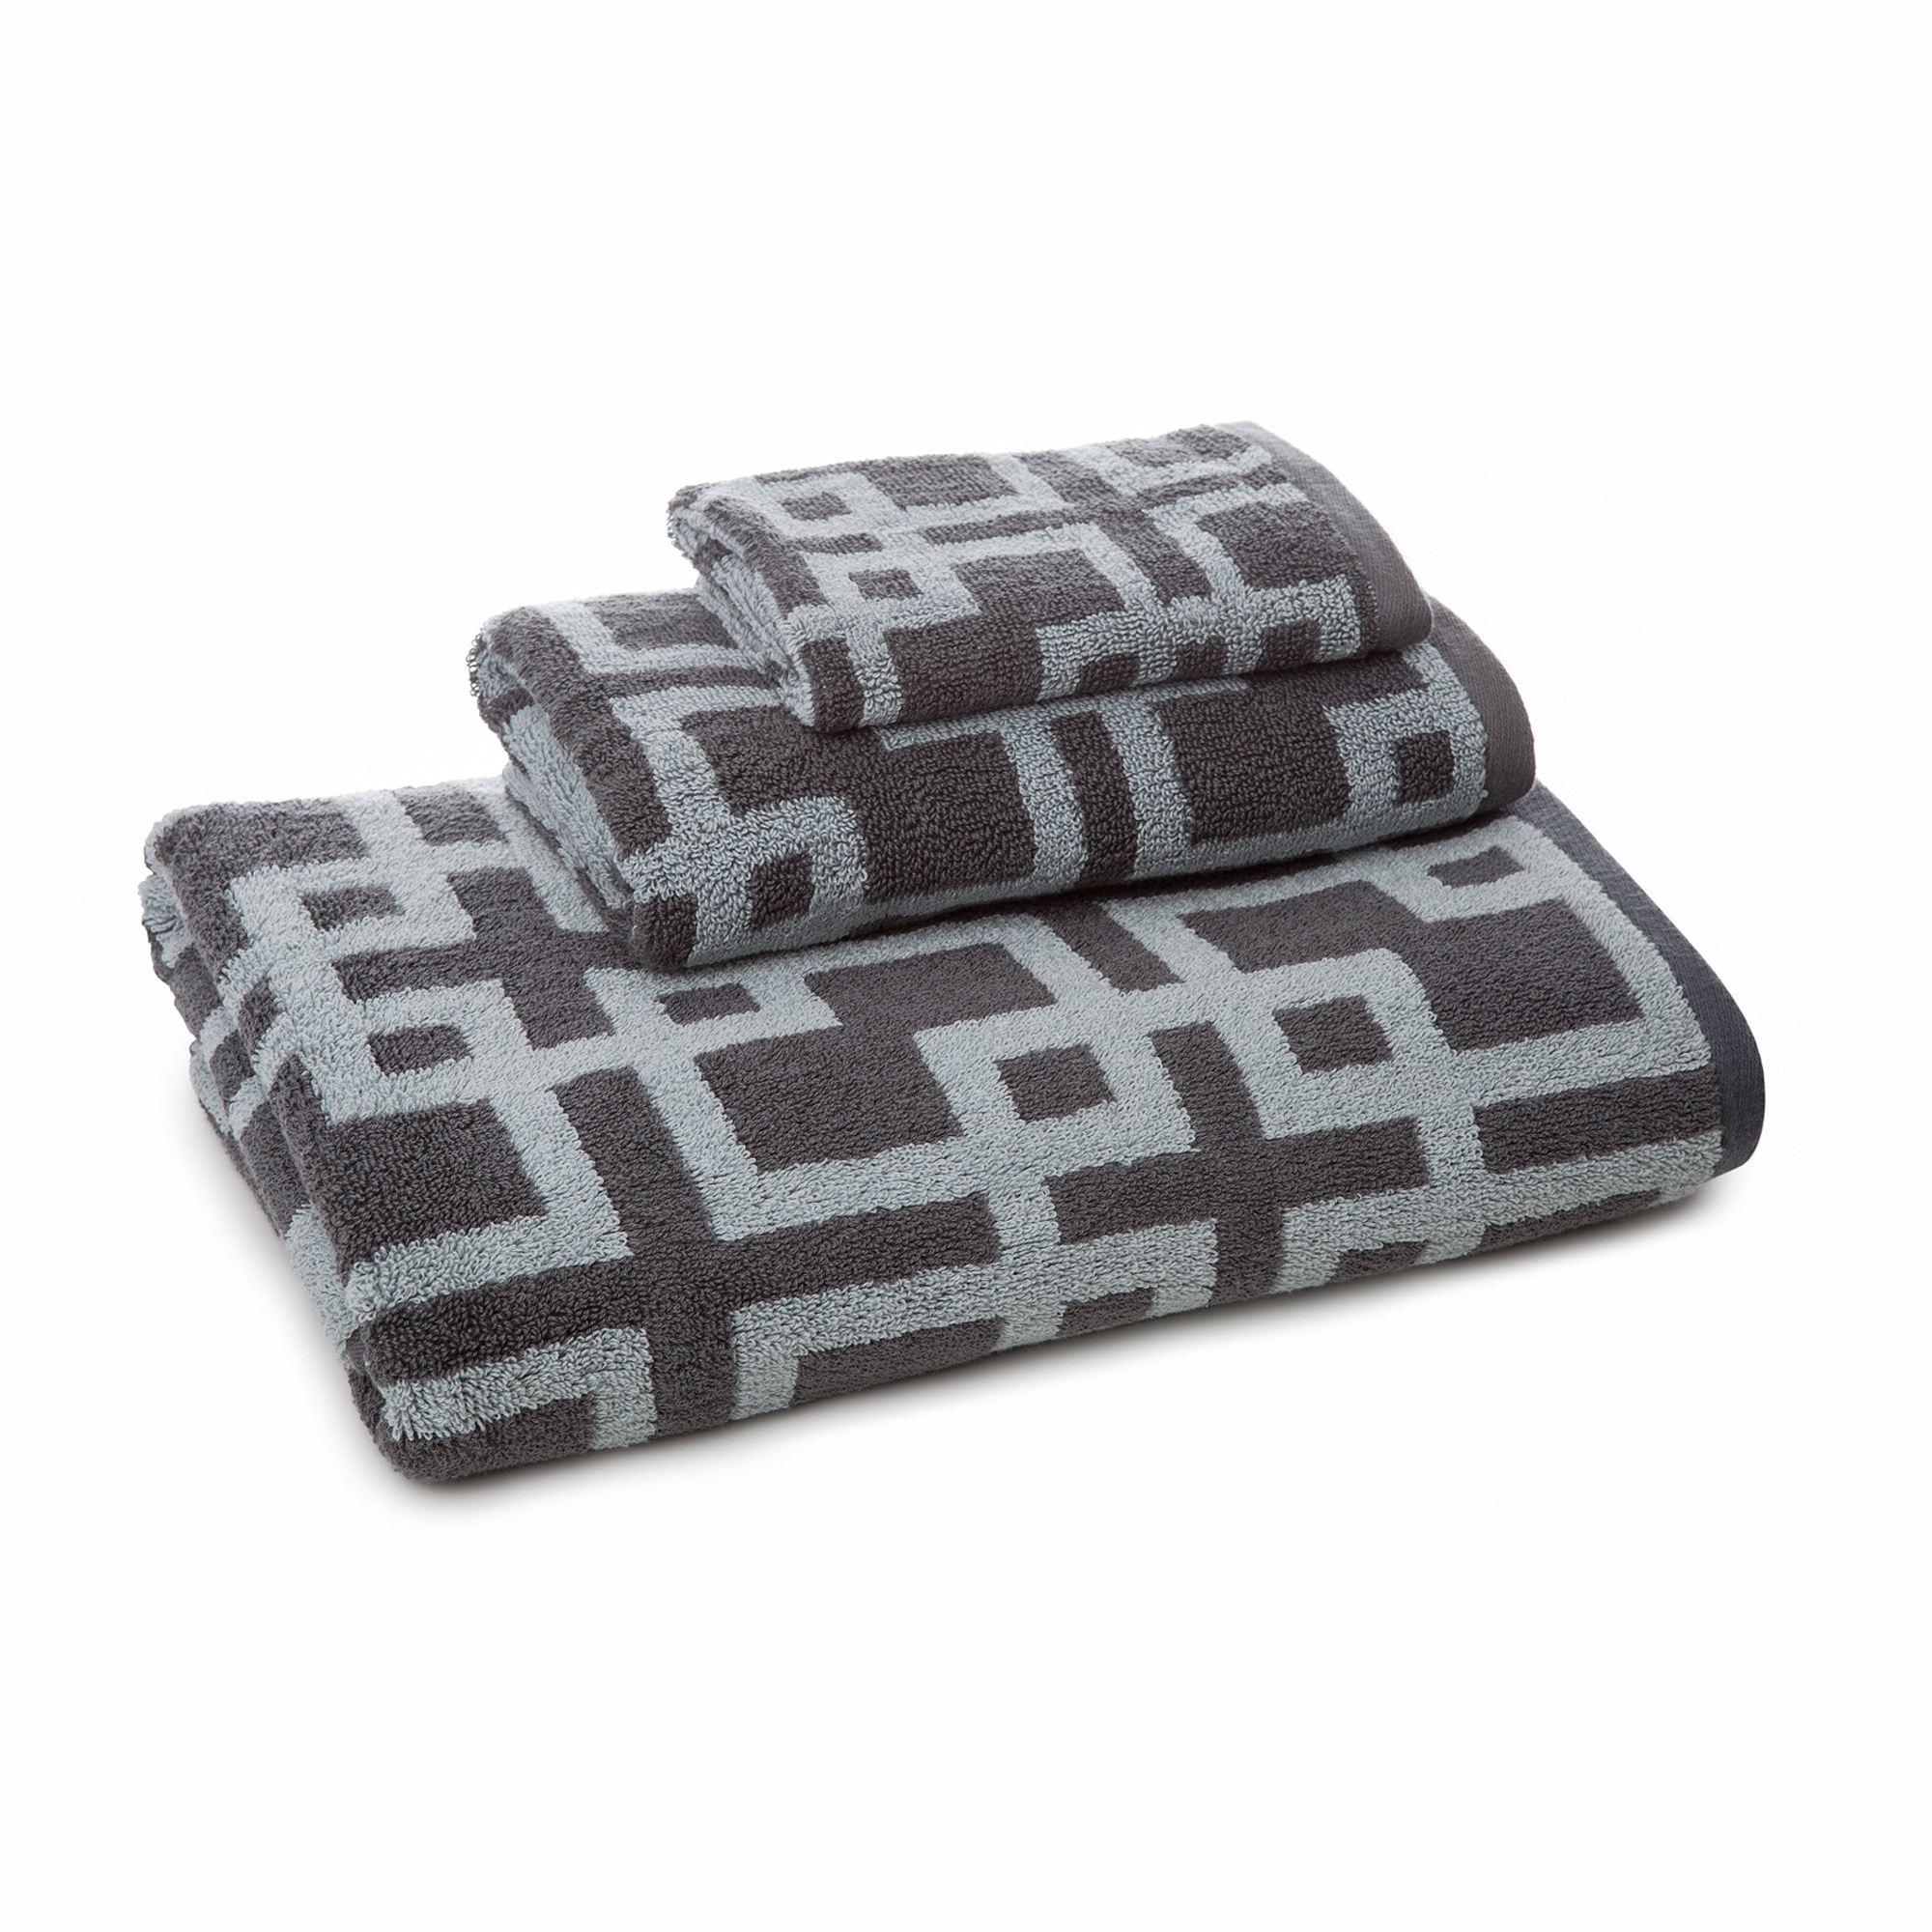 Vicki Payne Home Chippendale 3-Piece Bath Towel Set